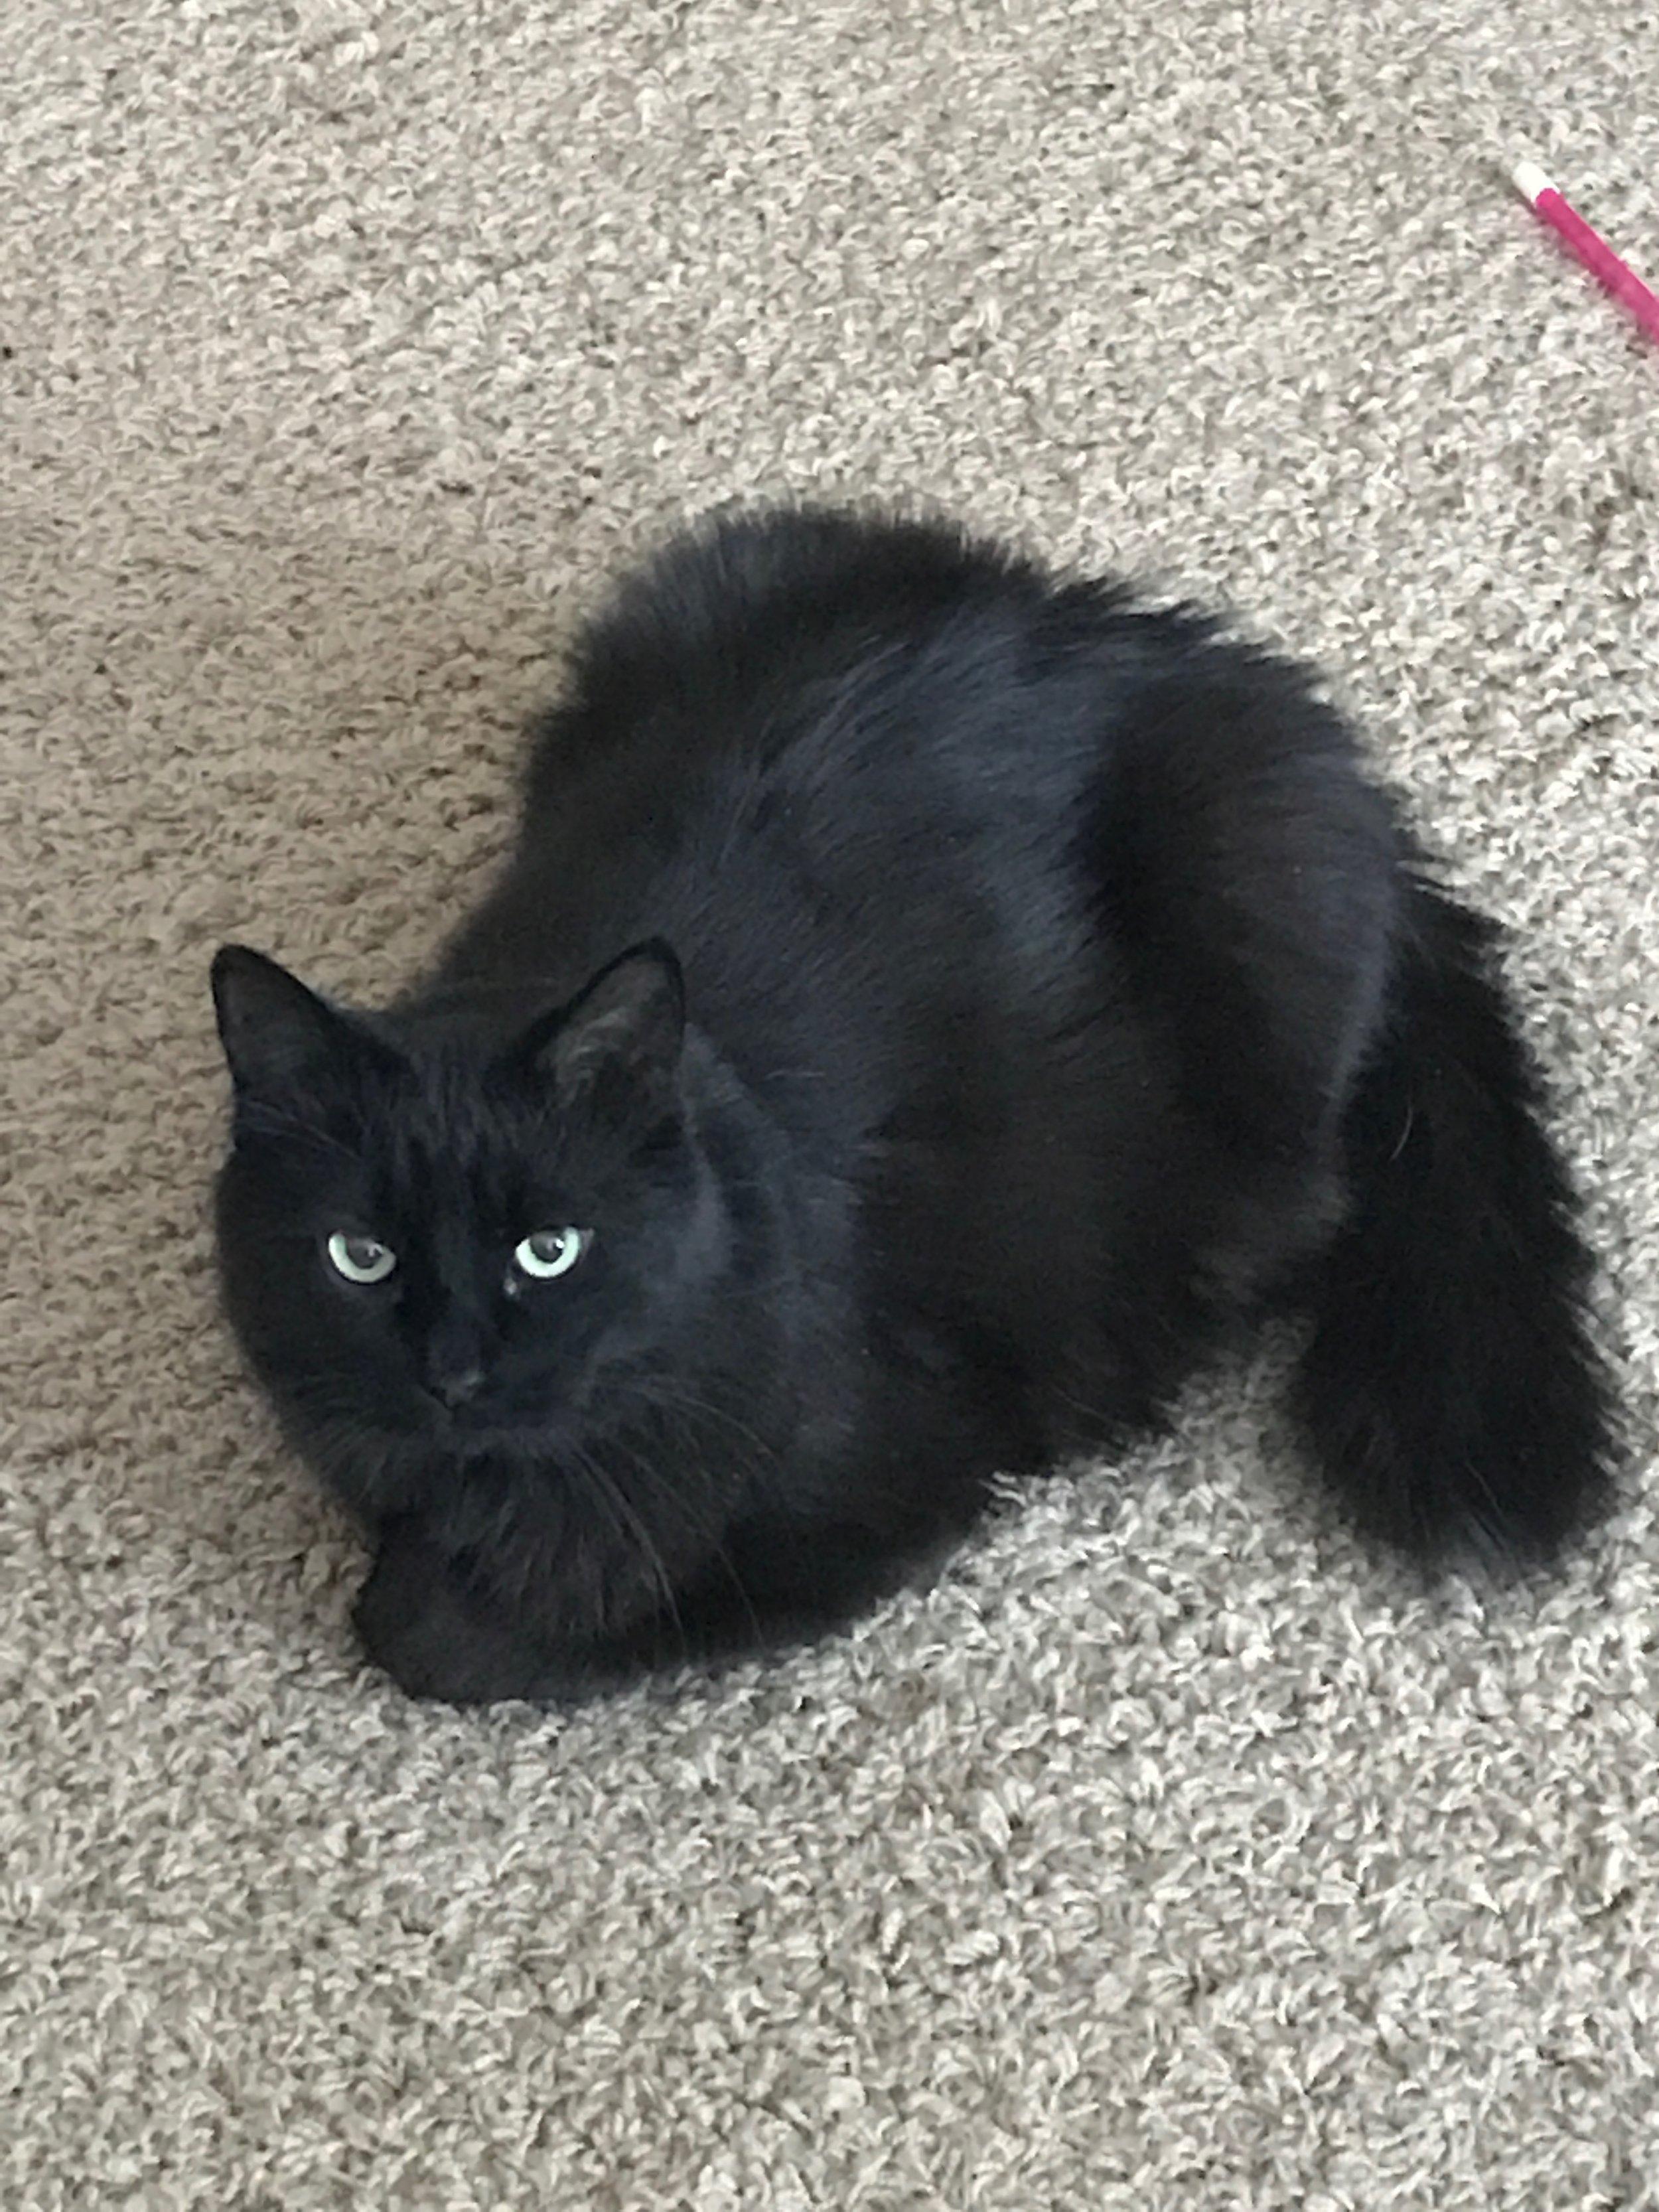 August-cat.JPG